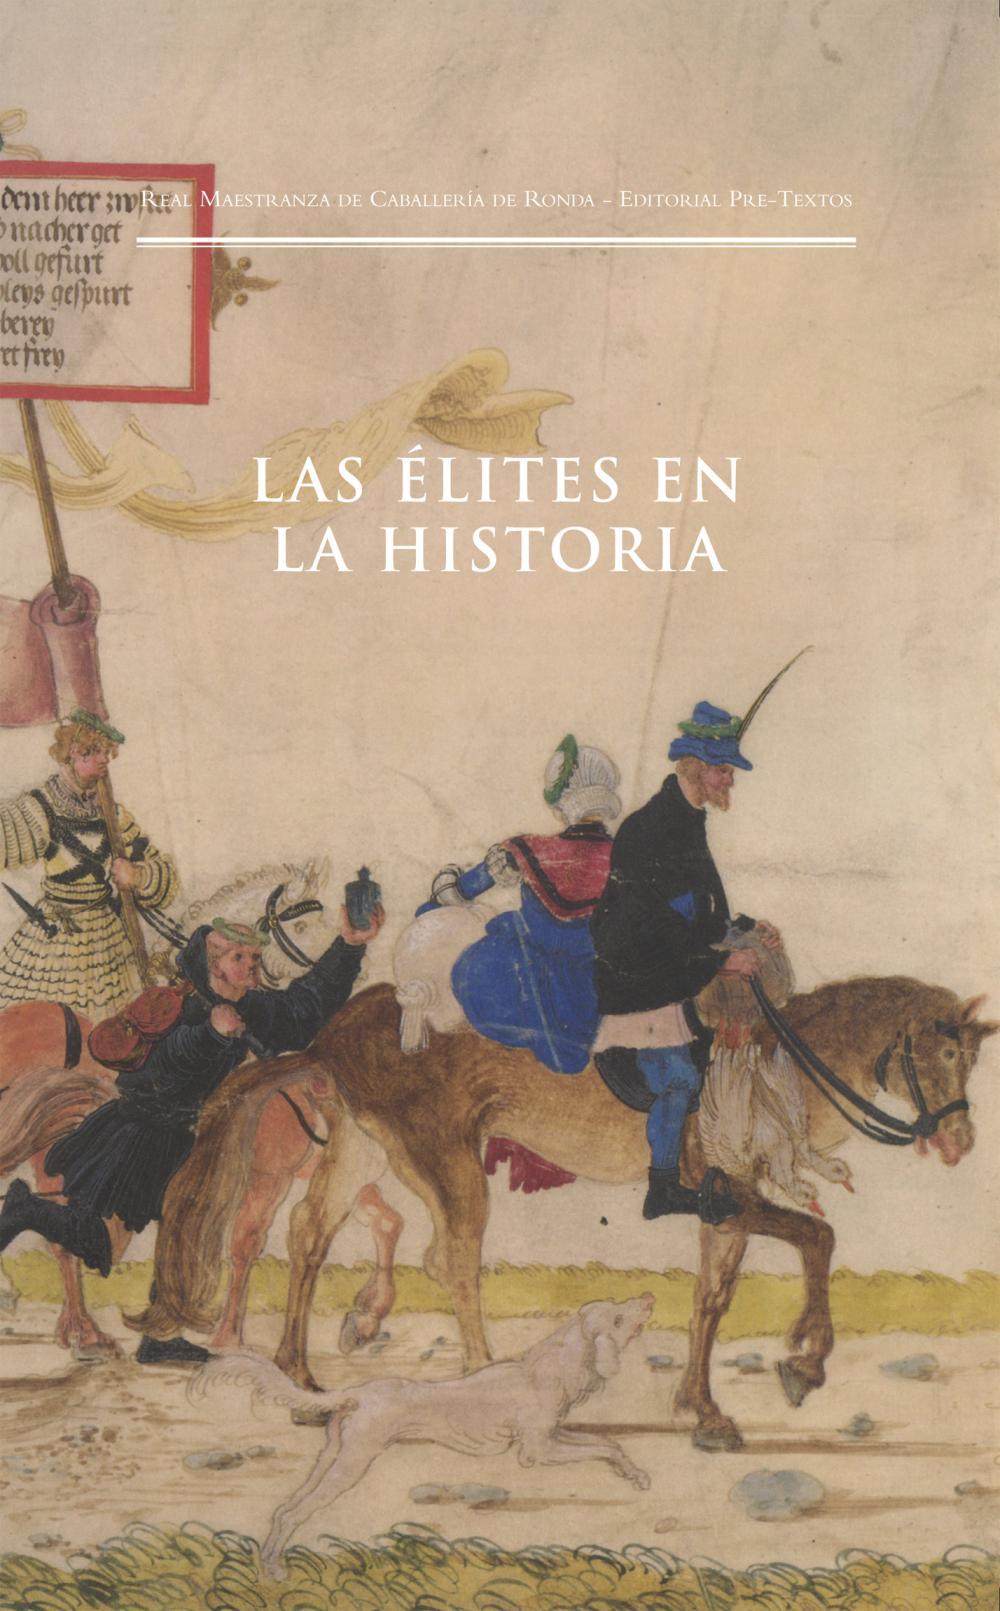 Las élites en la historia